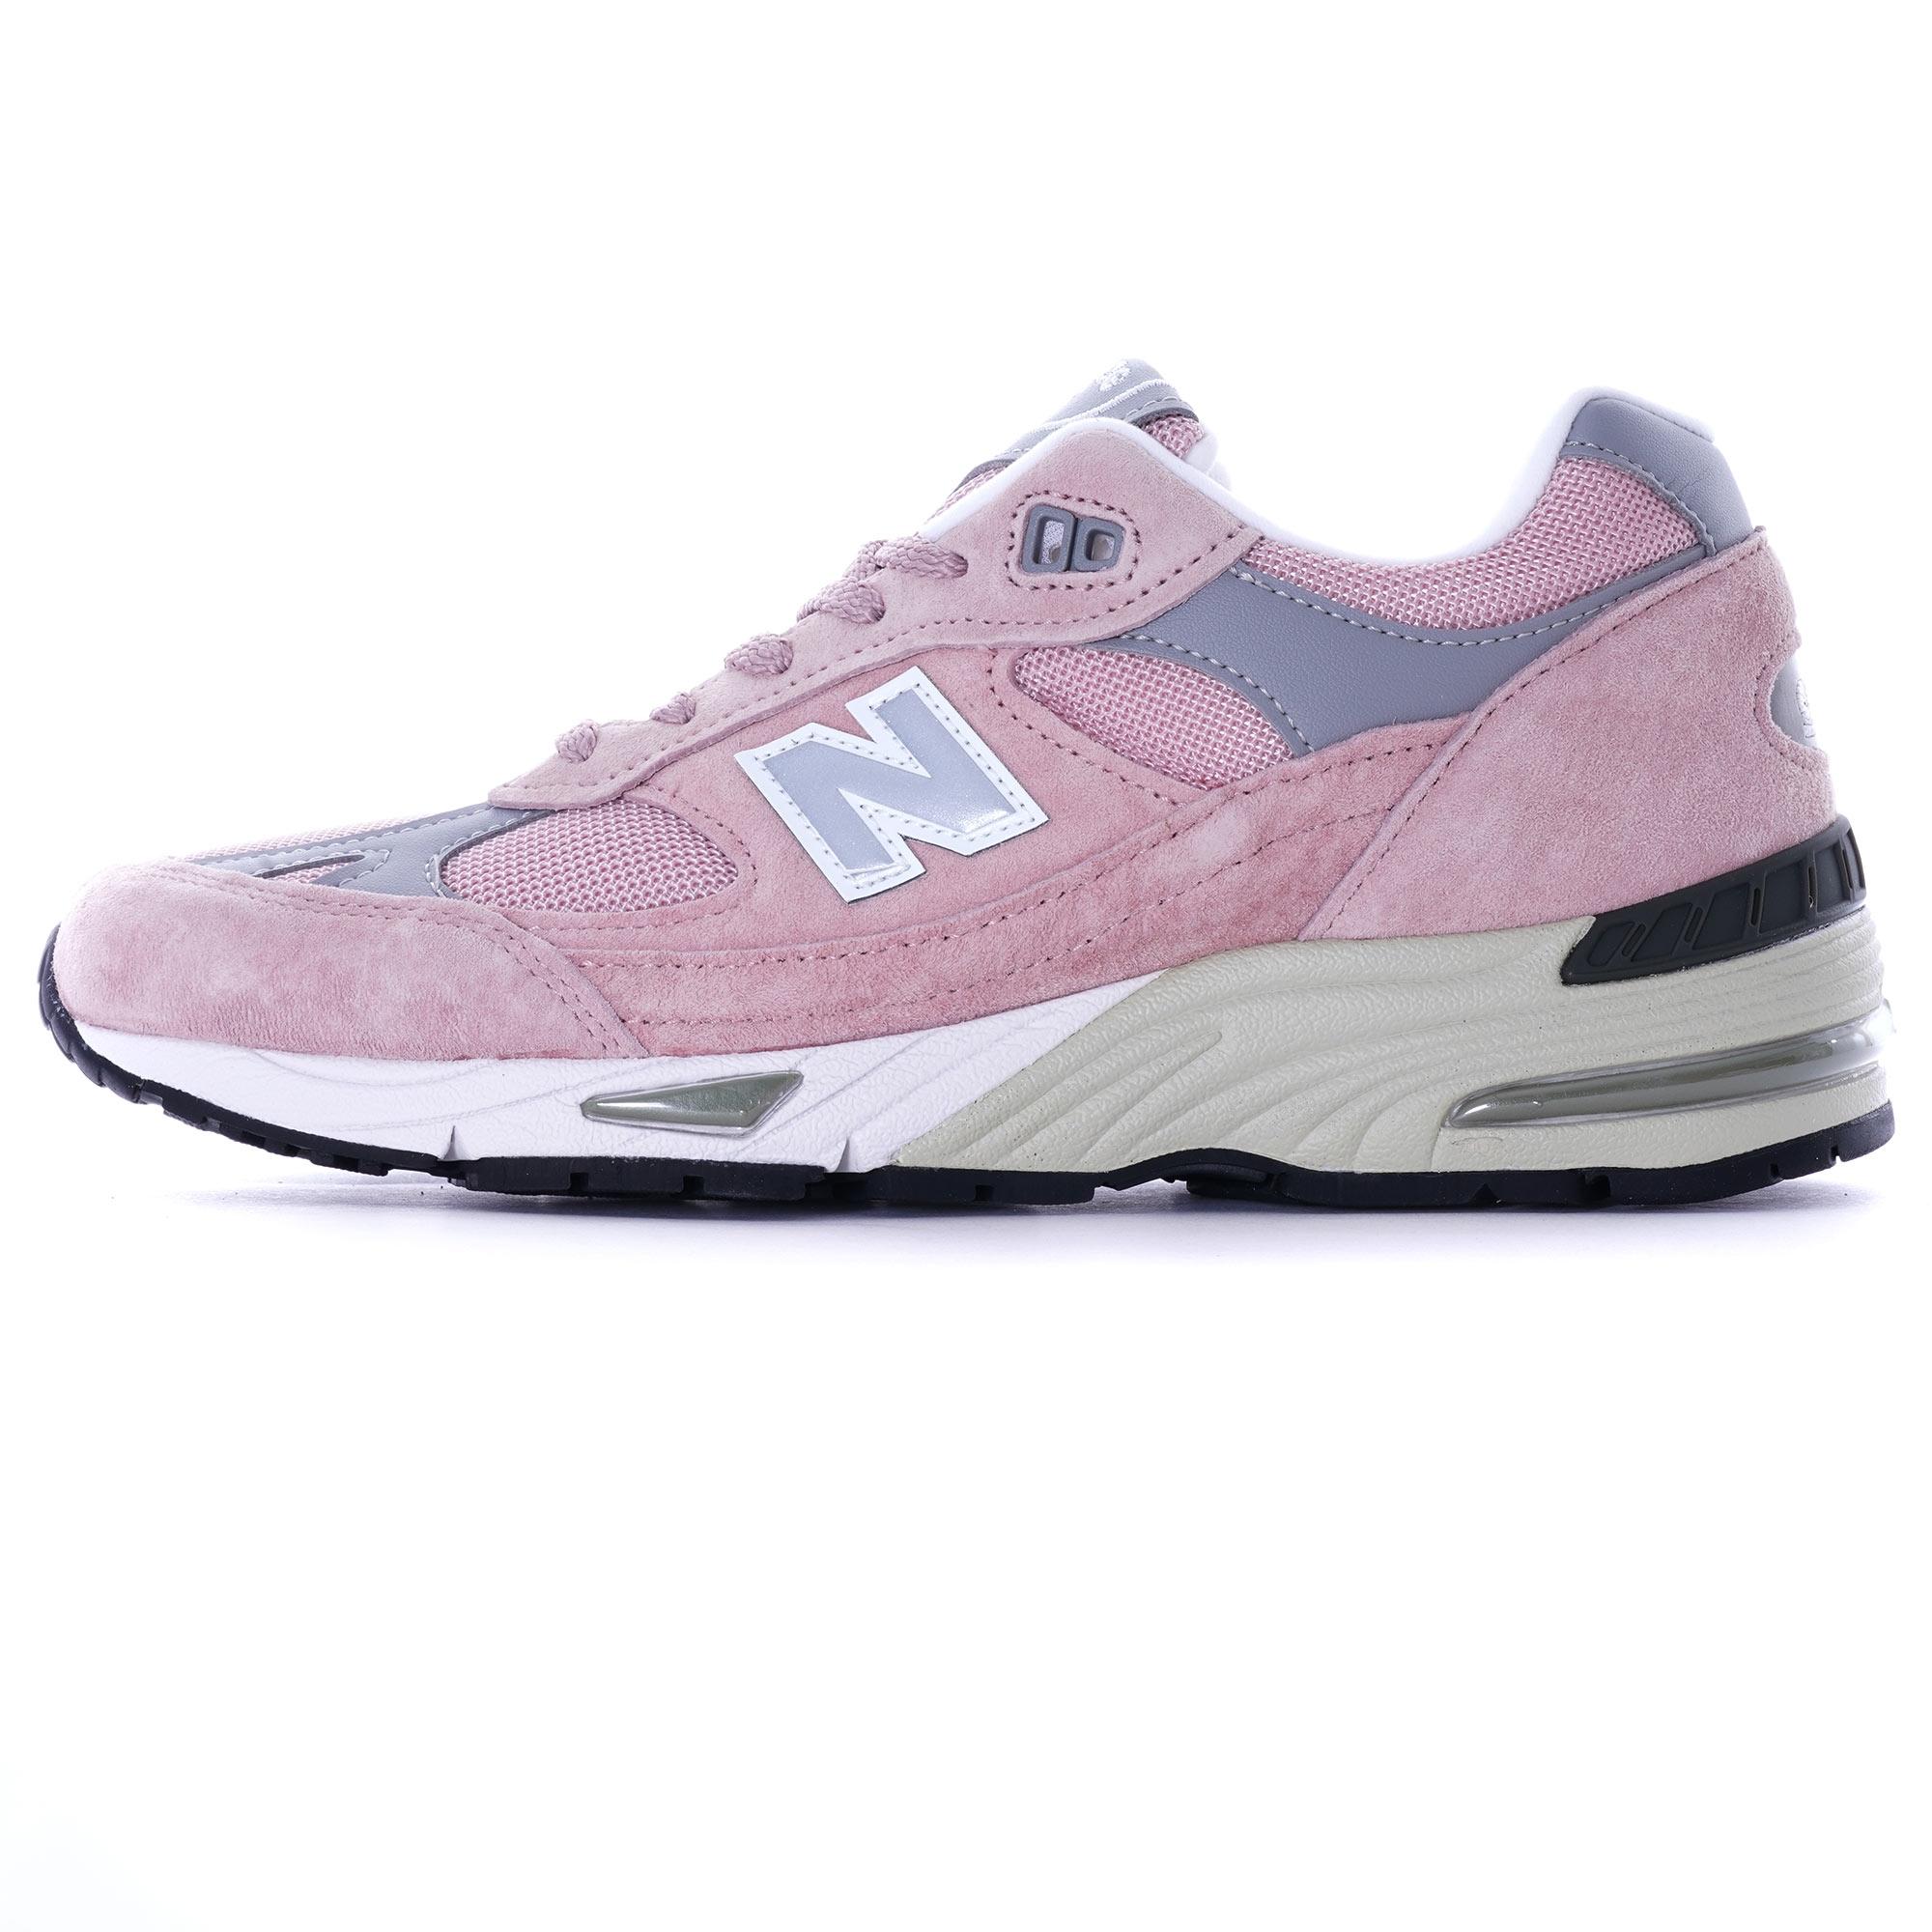 New Balance Made In England 991 | Pink | M991PNK-PNK